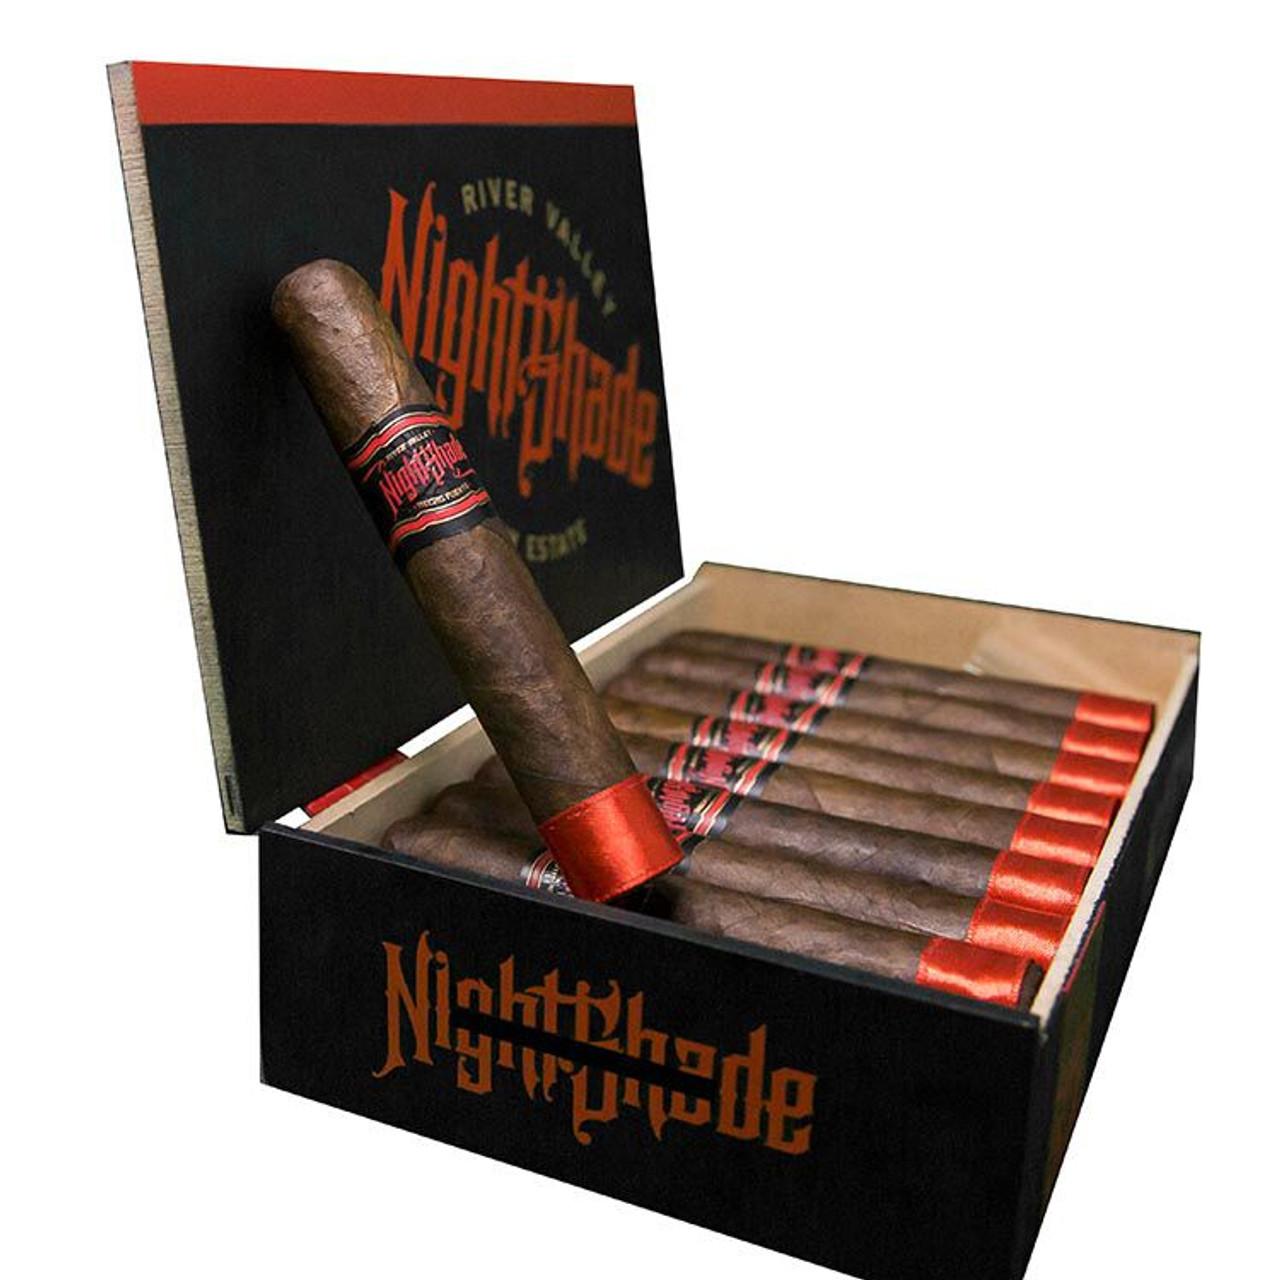 NightShade by Drew Estate Robusto Cigars - 5 x 52 (Box of 20)